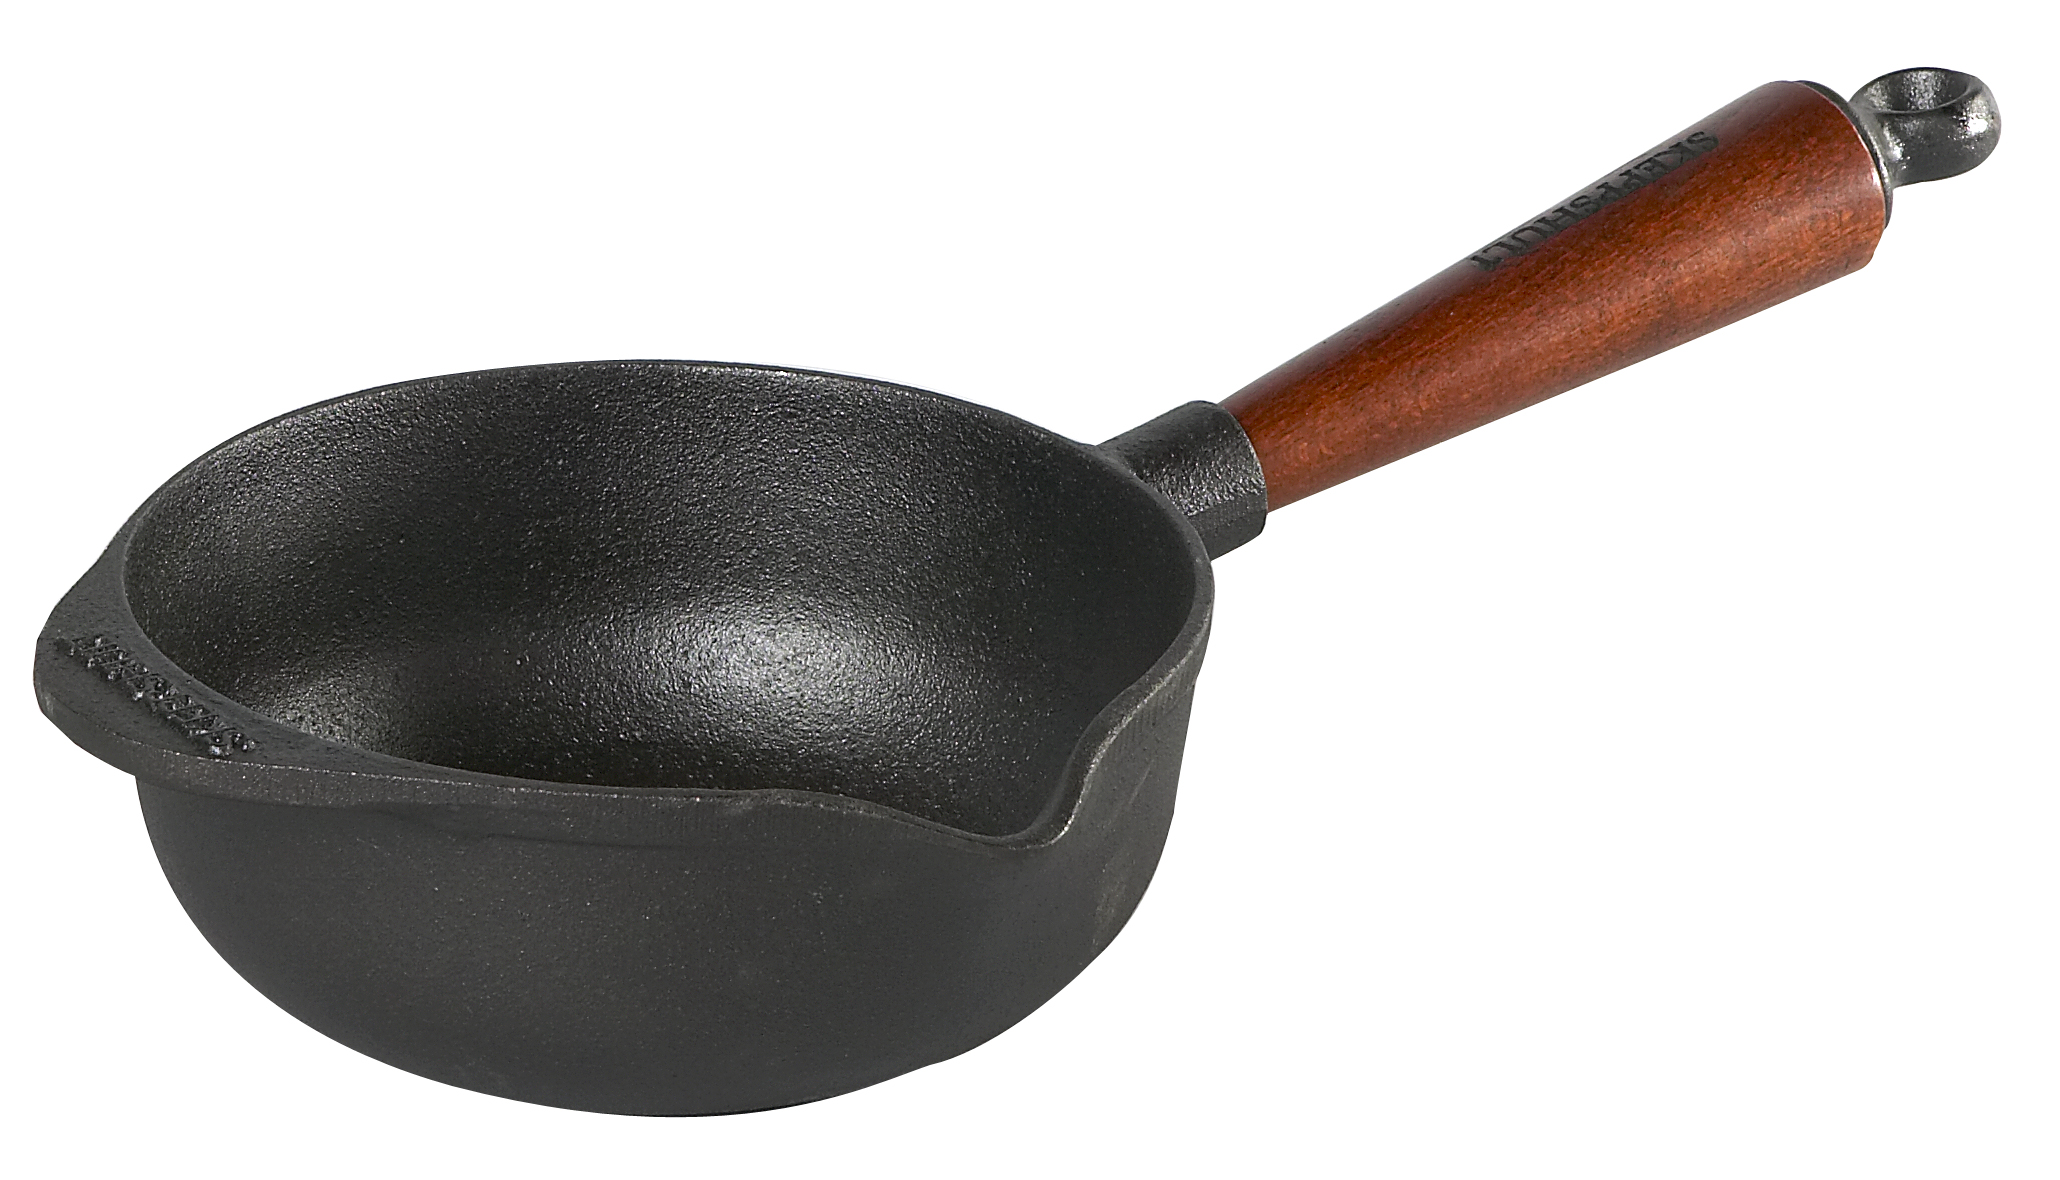 Skeppshult Støpejern Sauskasserolle 1 l Trehåndtak